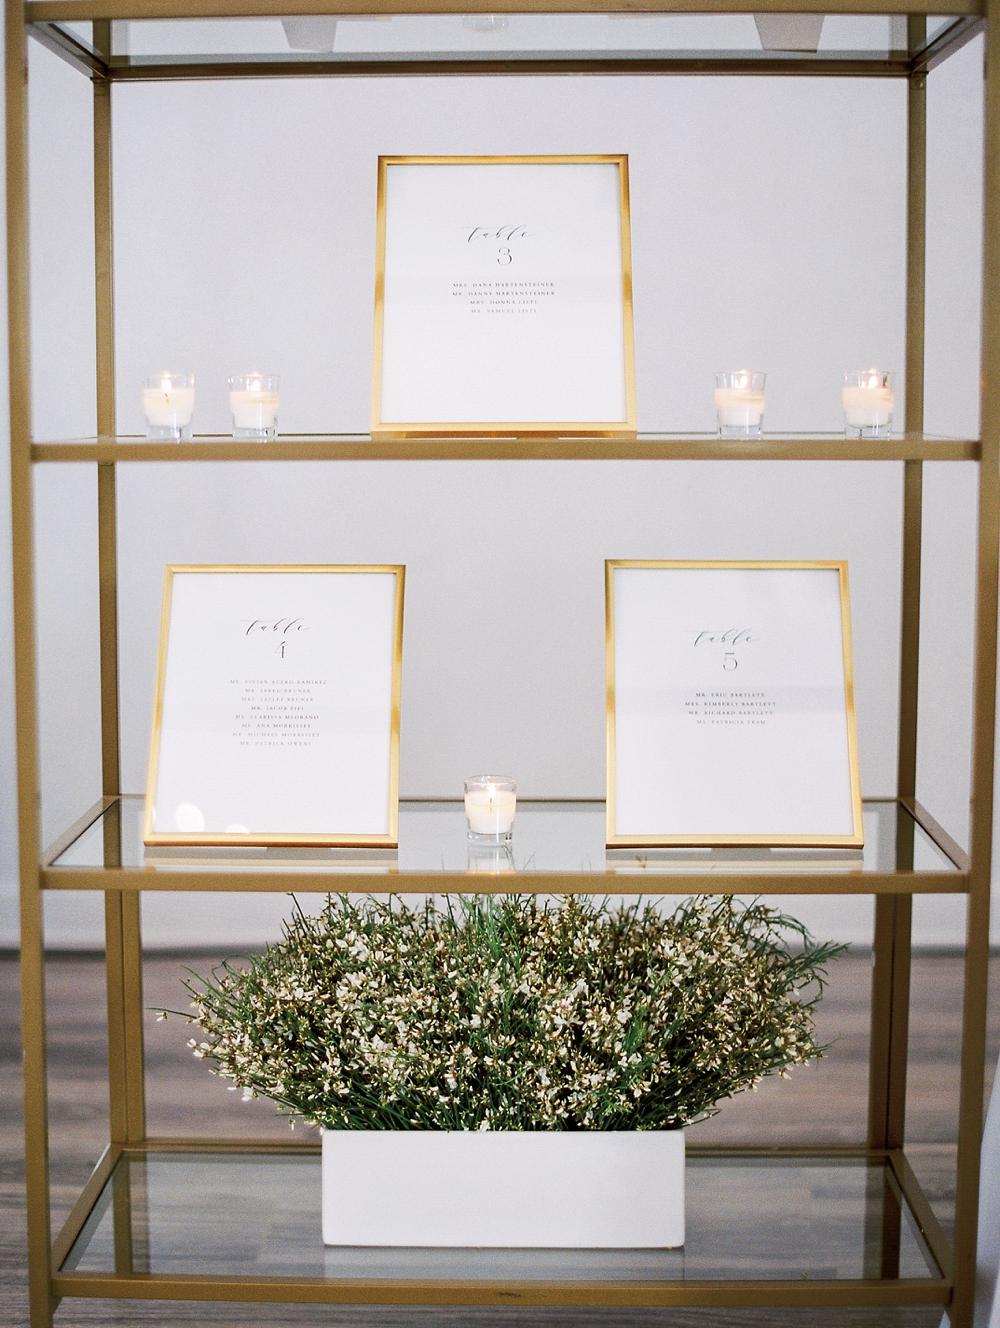 Kristin-La-Voie-Photography-austin-houston-texas-wedding-photographer-the-oaks-at-high-hill -122